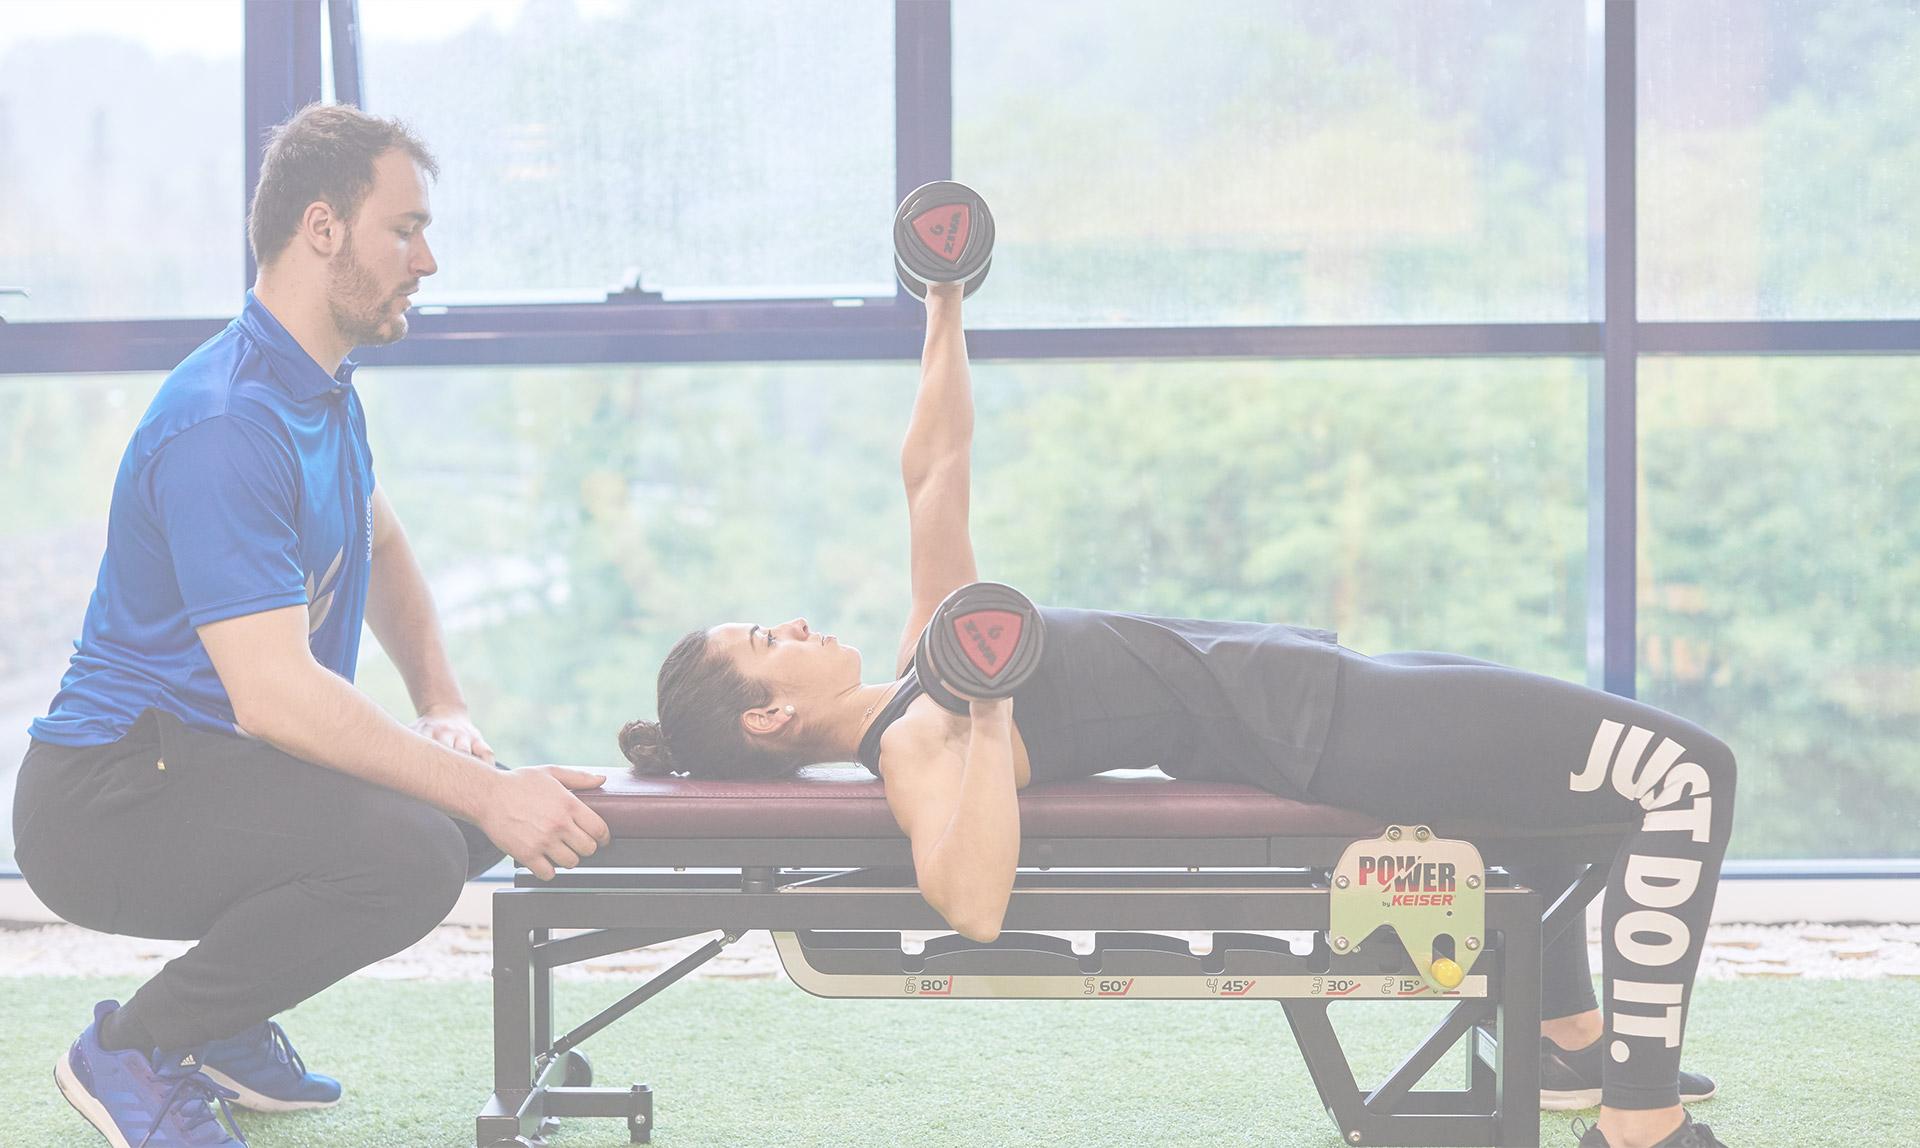 centro-entrenamiento-rehabilitacion-osasun-sport-sergio-sukunza-san-sebastian-donostia